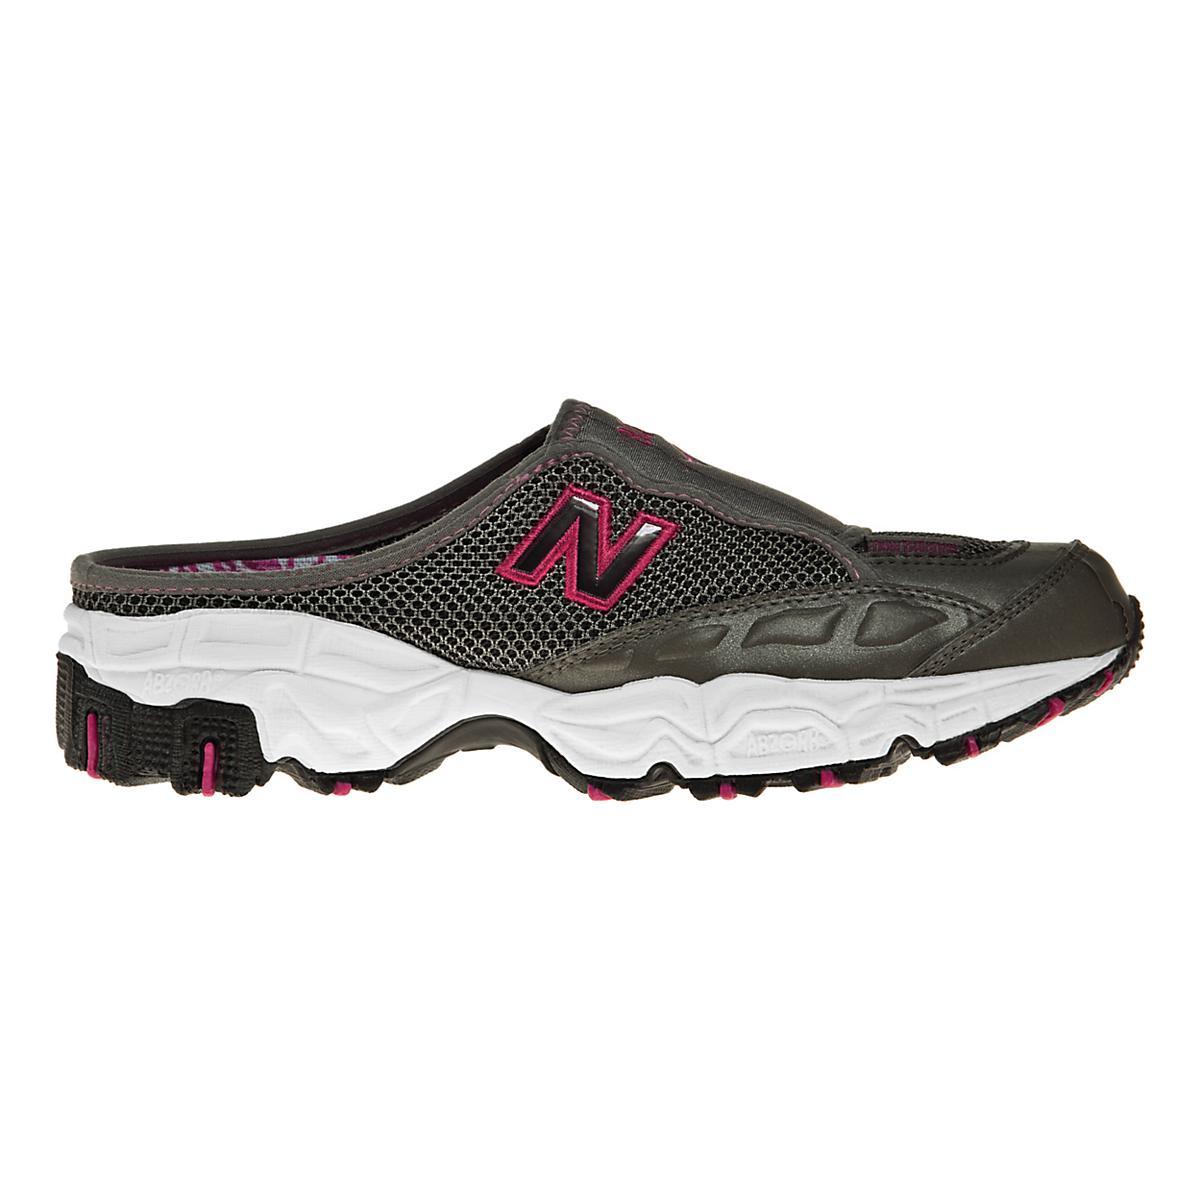 2f4f43b7d2790 Womens New Balance 801 Casual Shoe at Road Runner Sports